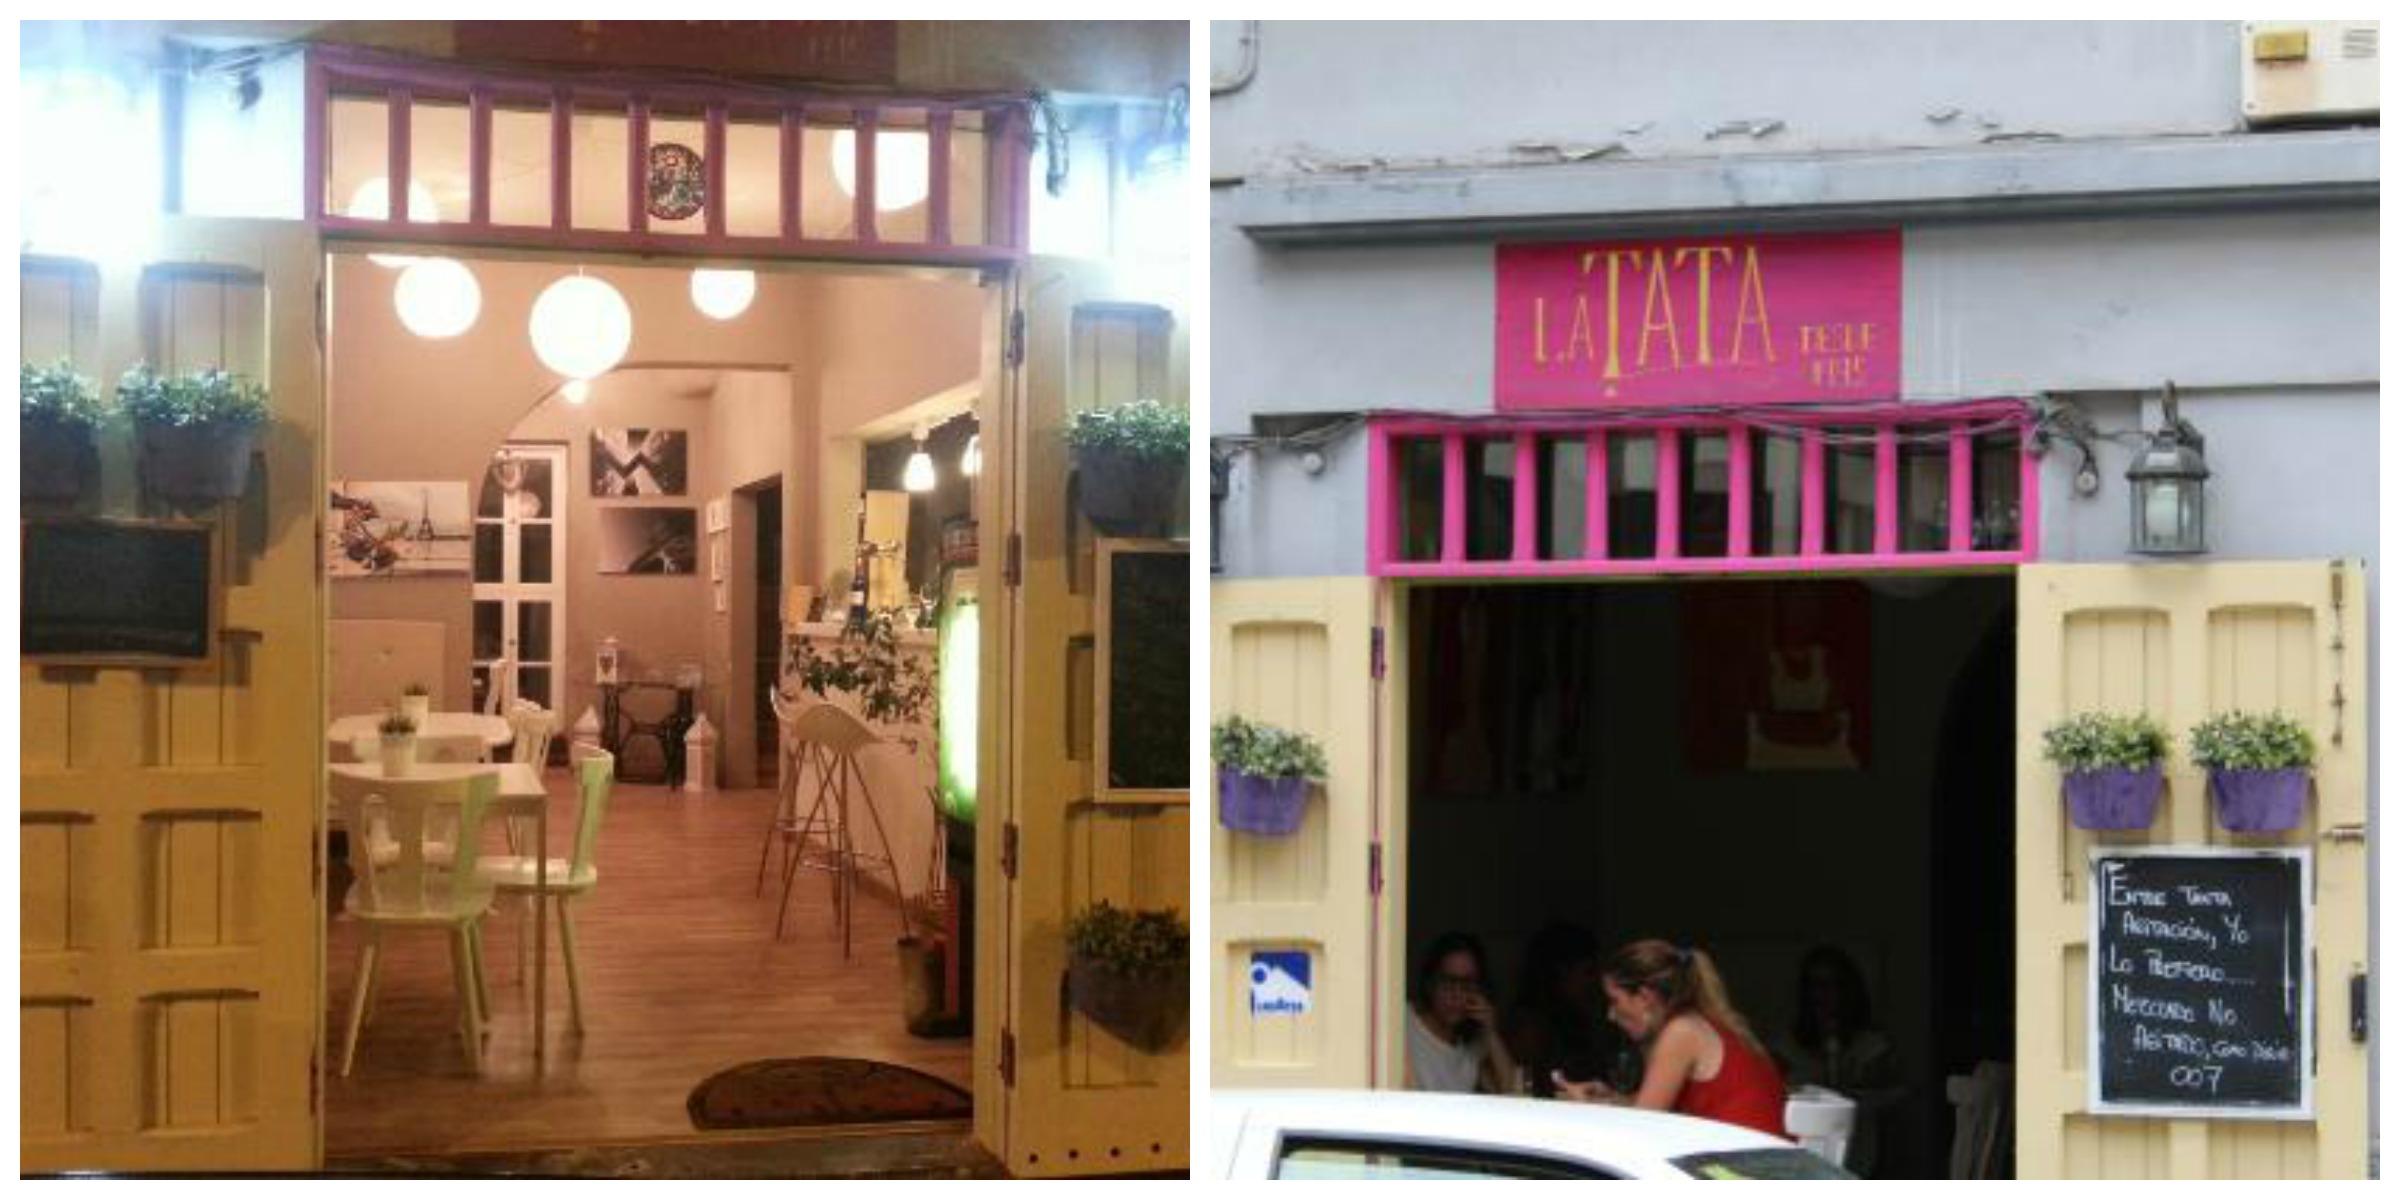 Tasca la tata restaurant Tenerife